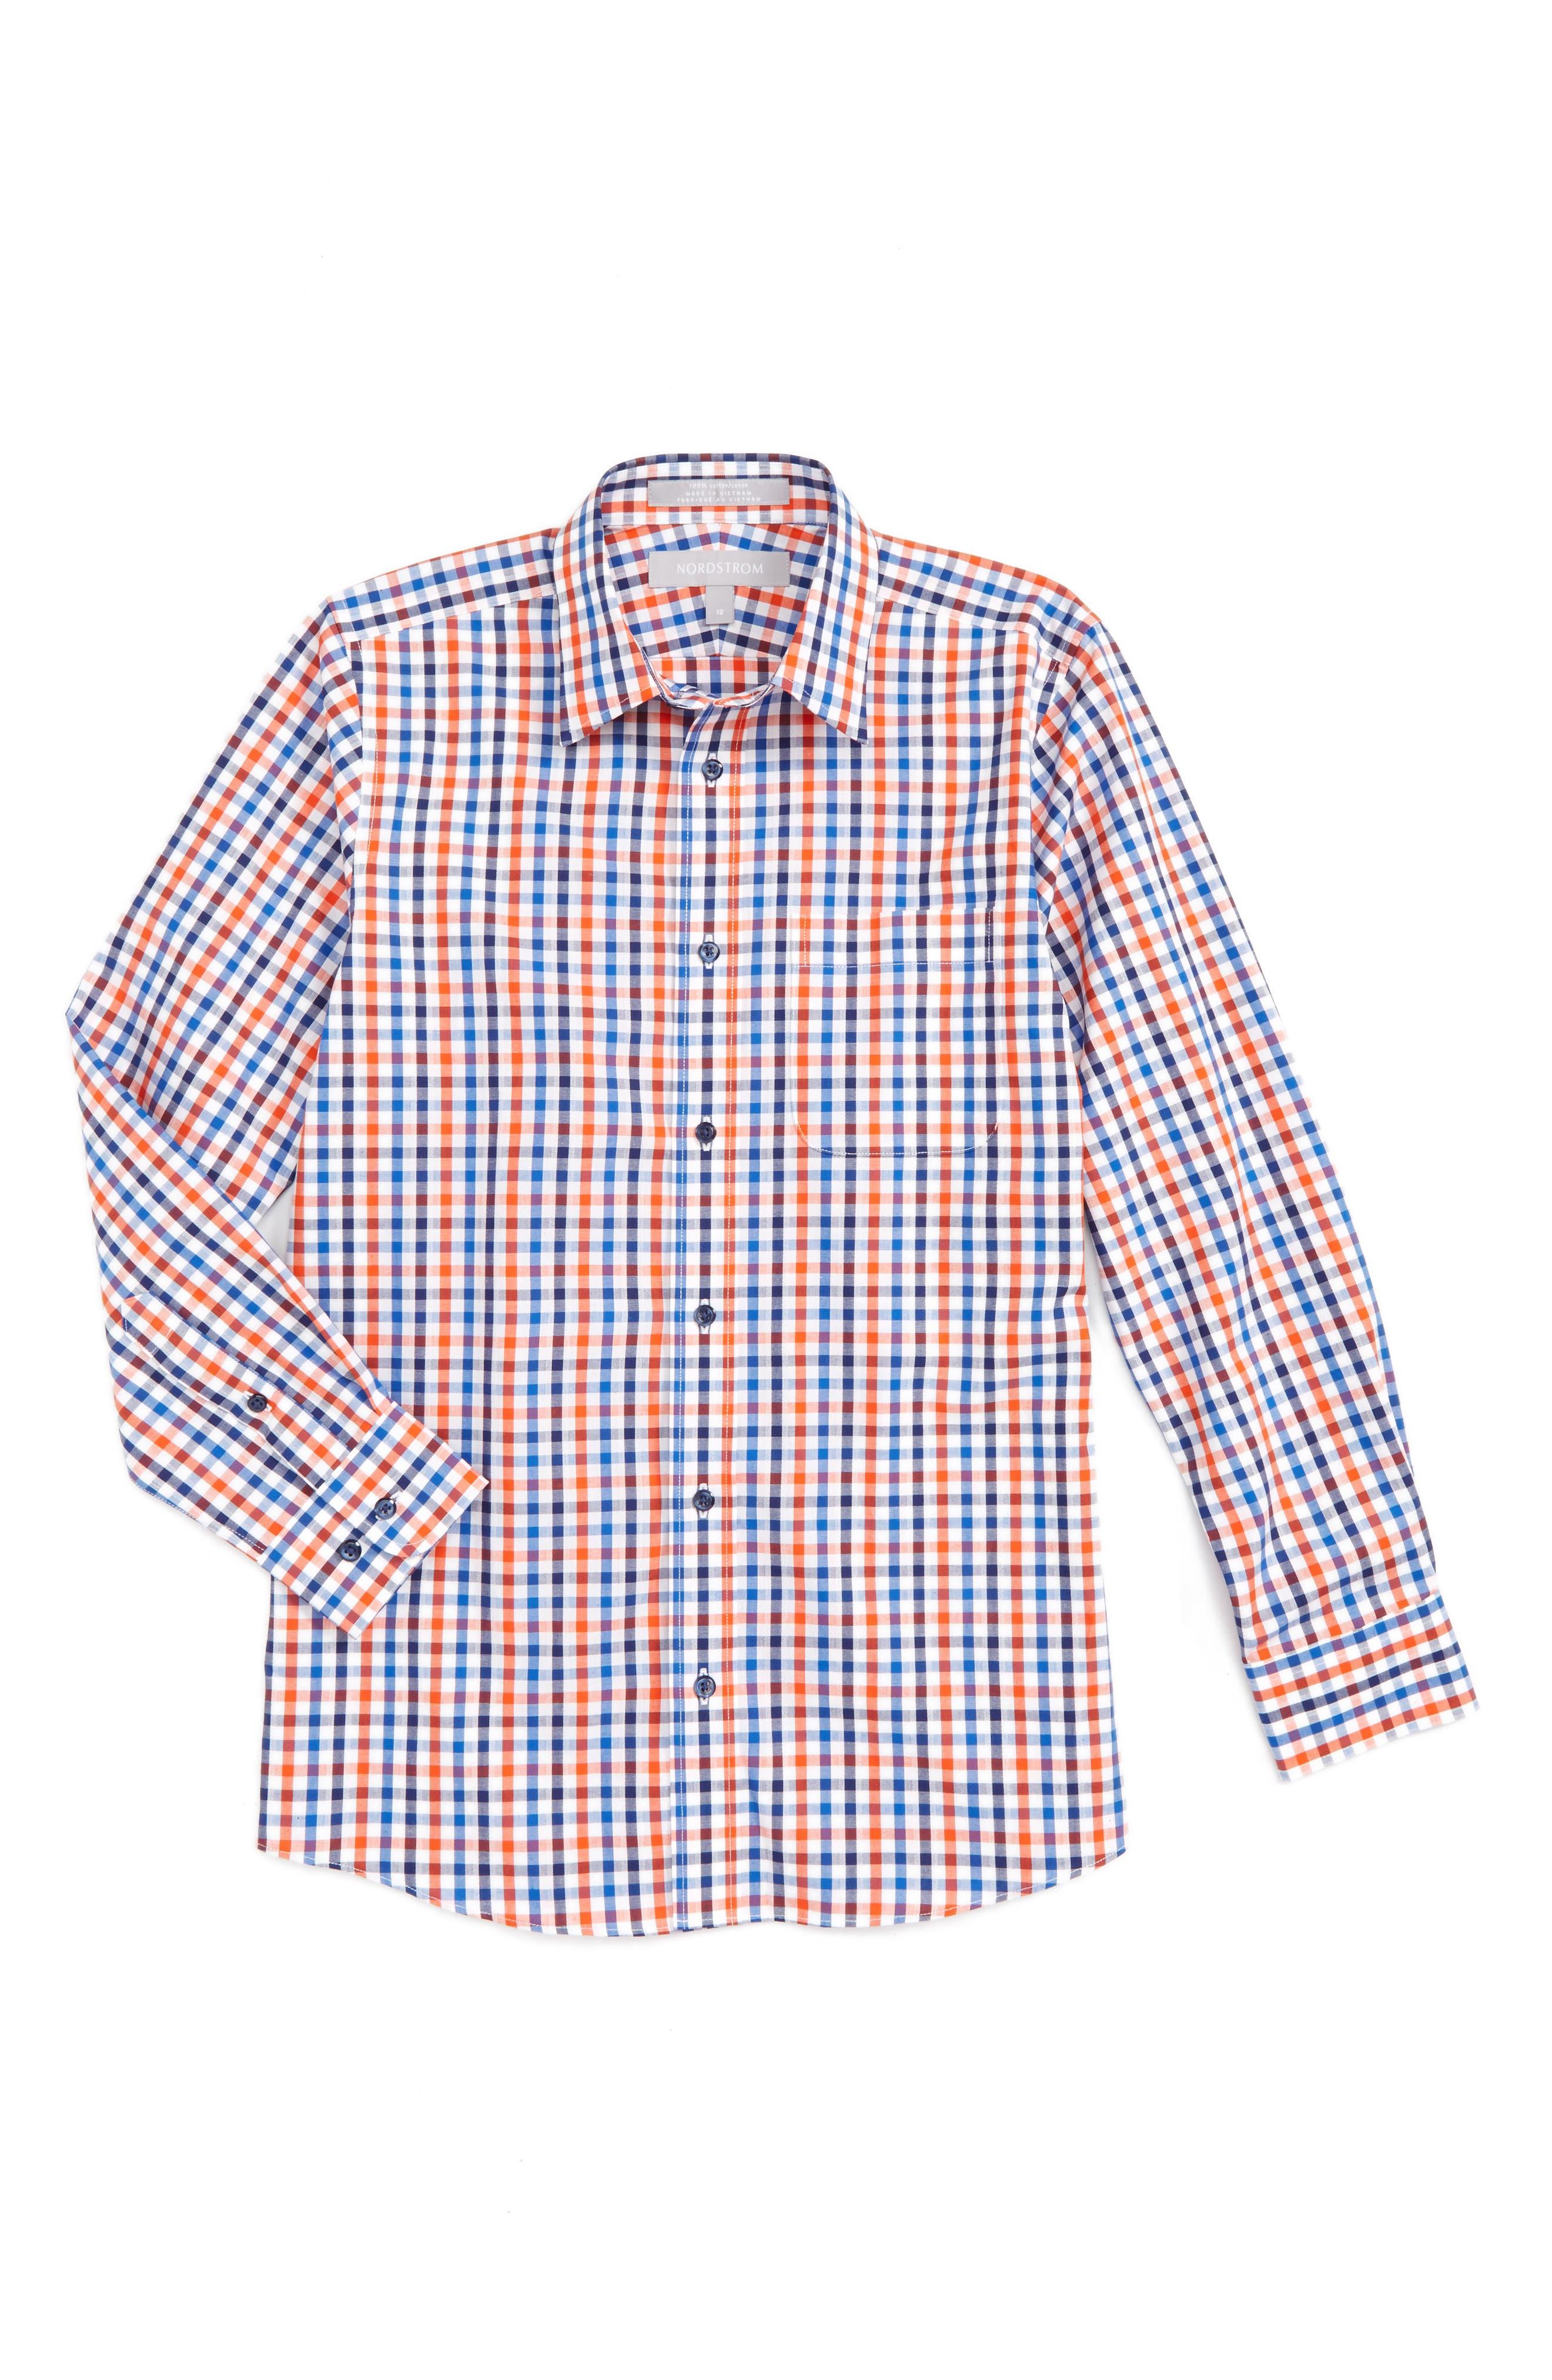 NORDSTROM Plaid Woven Shirt